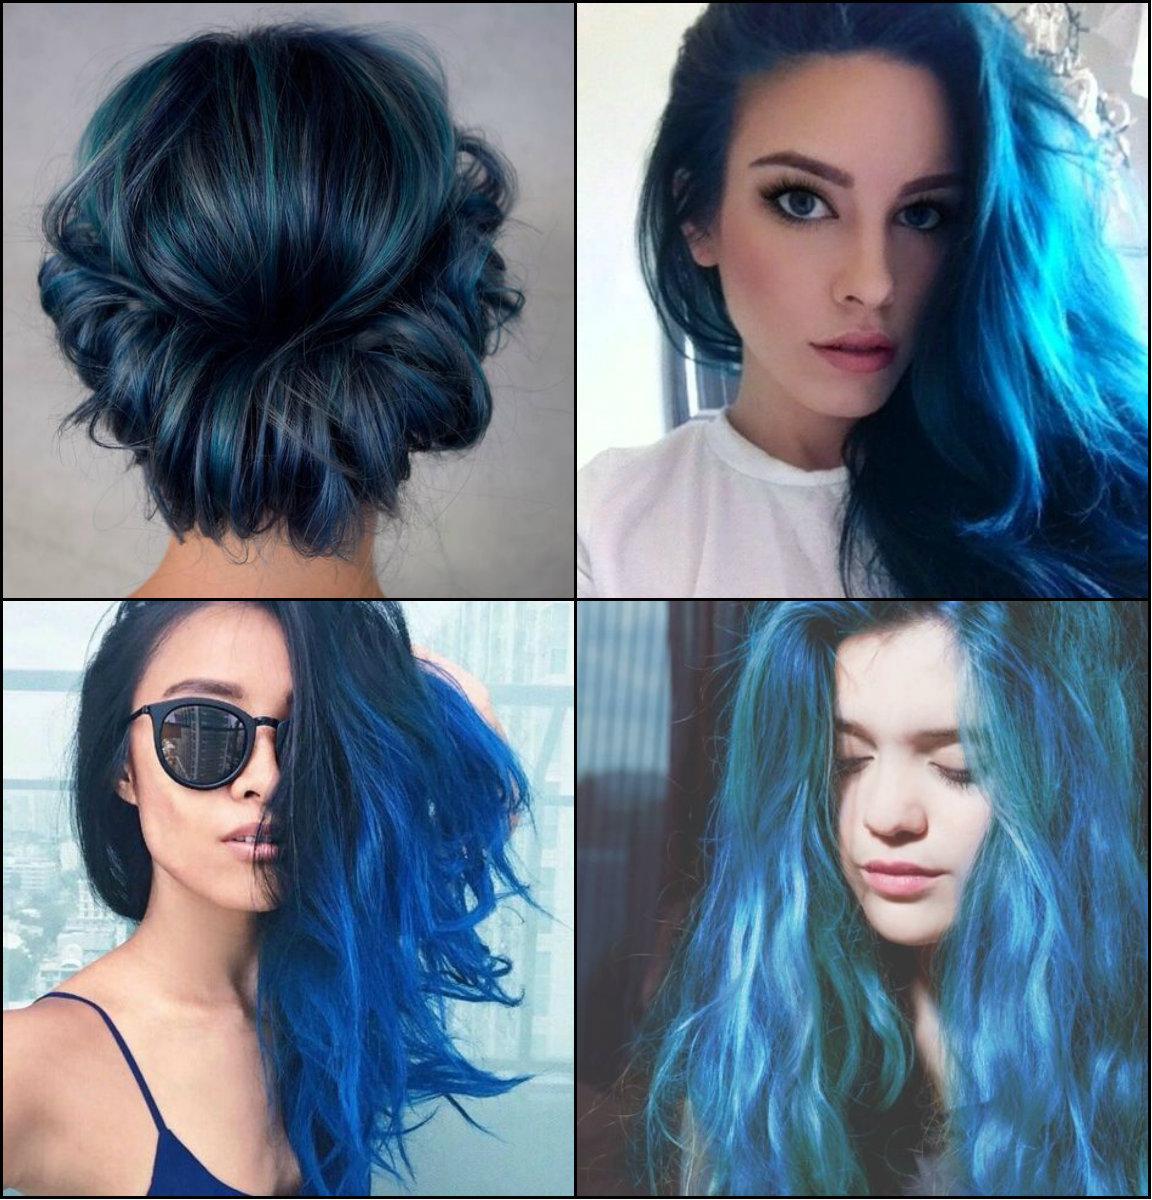 Sensational Hair Colors Archives Hairstyles 2017 Hair Colors And Haircuts Short Hairstyles For Black Women Fulllsitofus